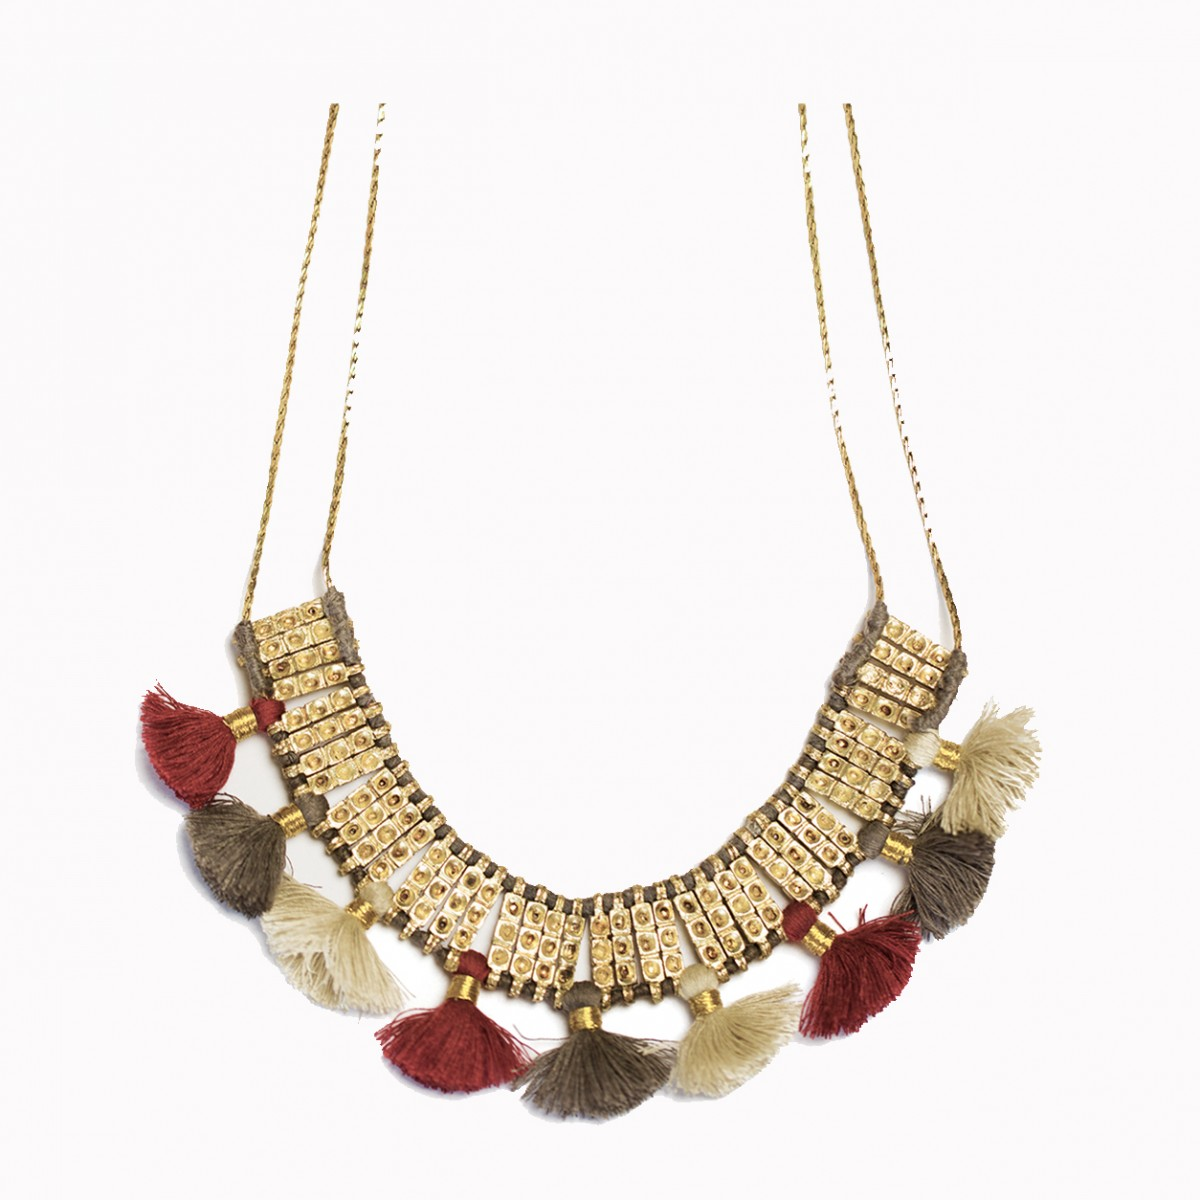 Handcrafted metal black tassel necklace